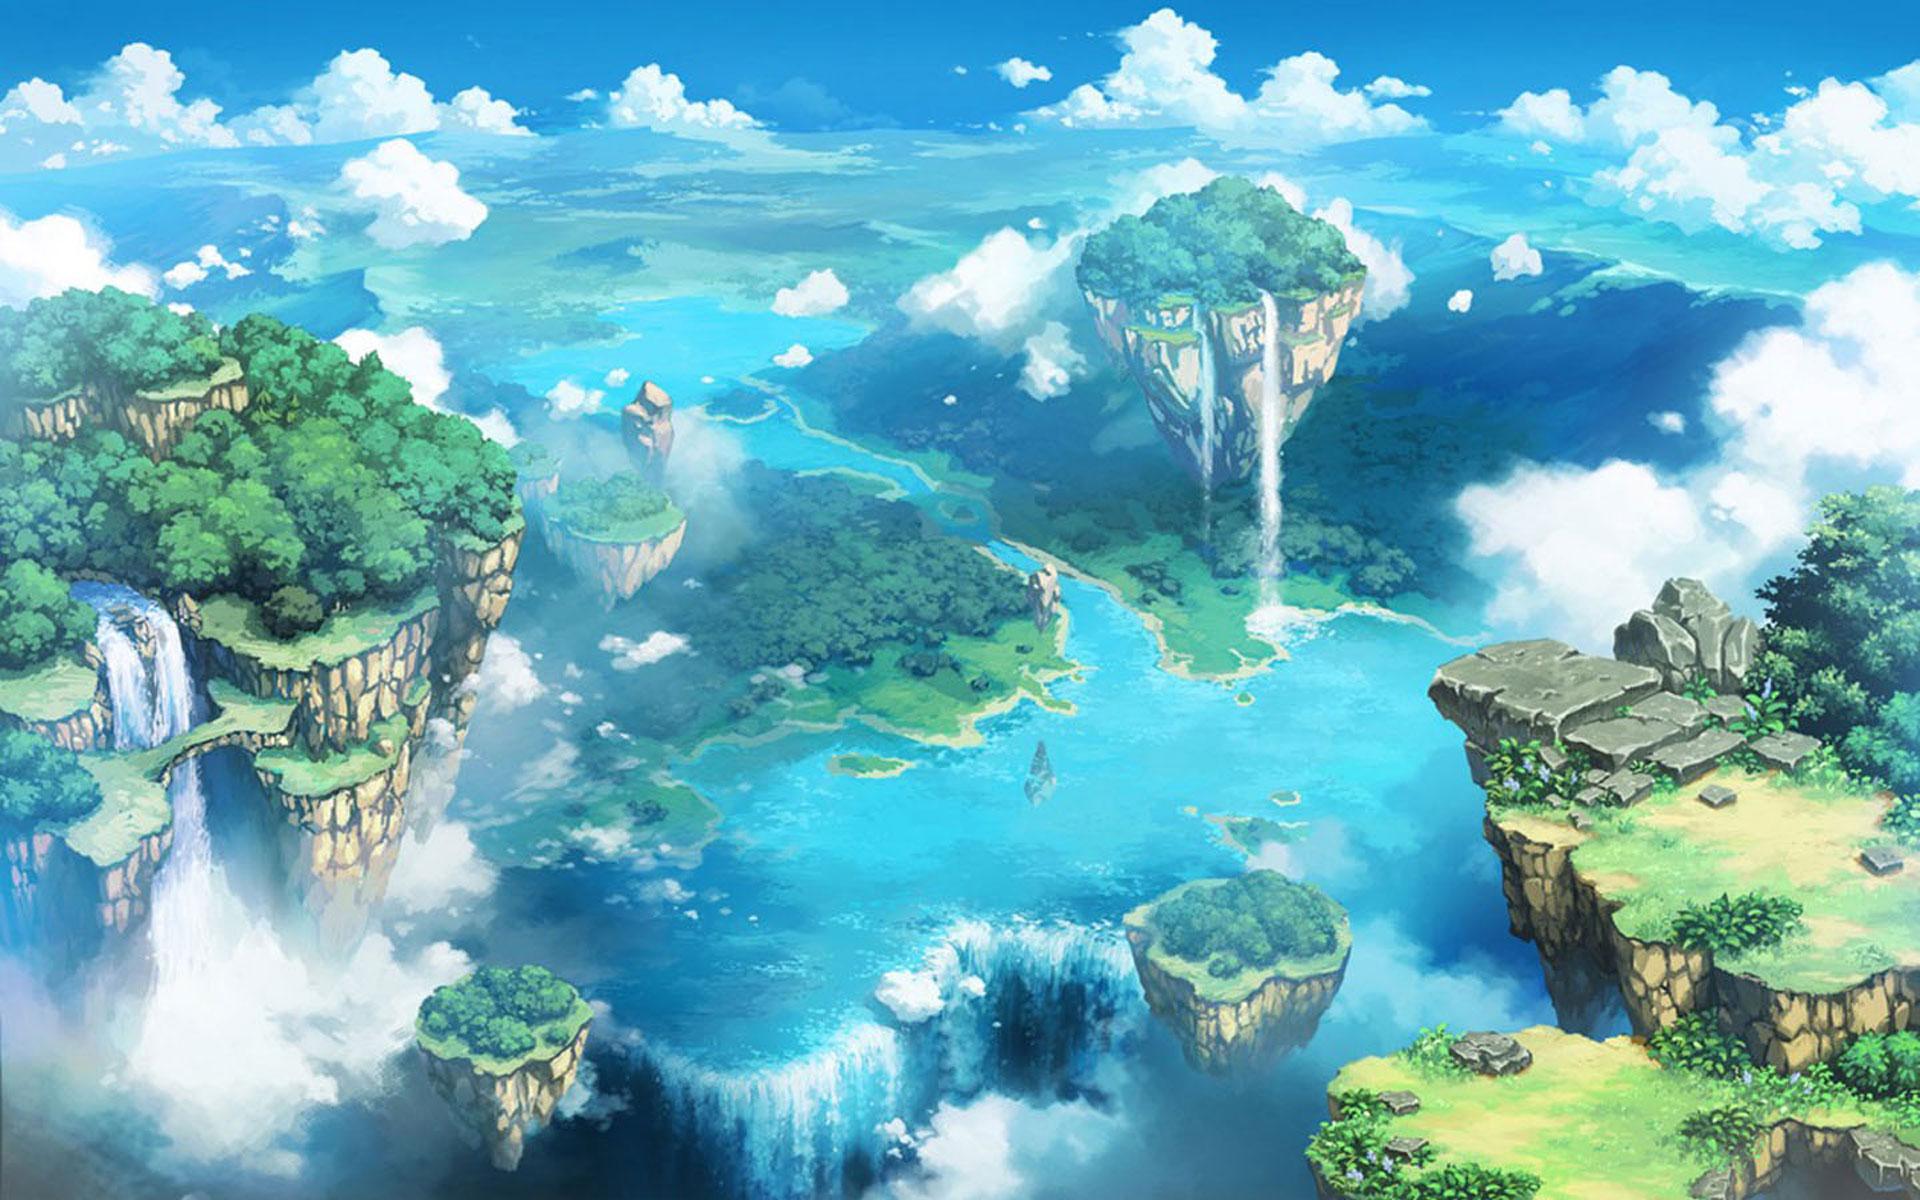 sky anime - Tìm với Google   Cảnh đẹp   Pinterest   Sky, Desktop